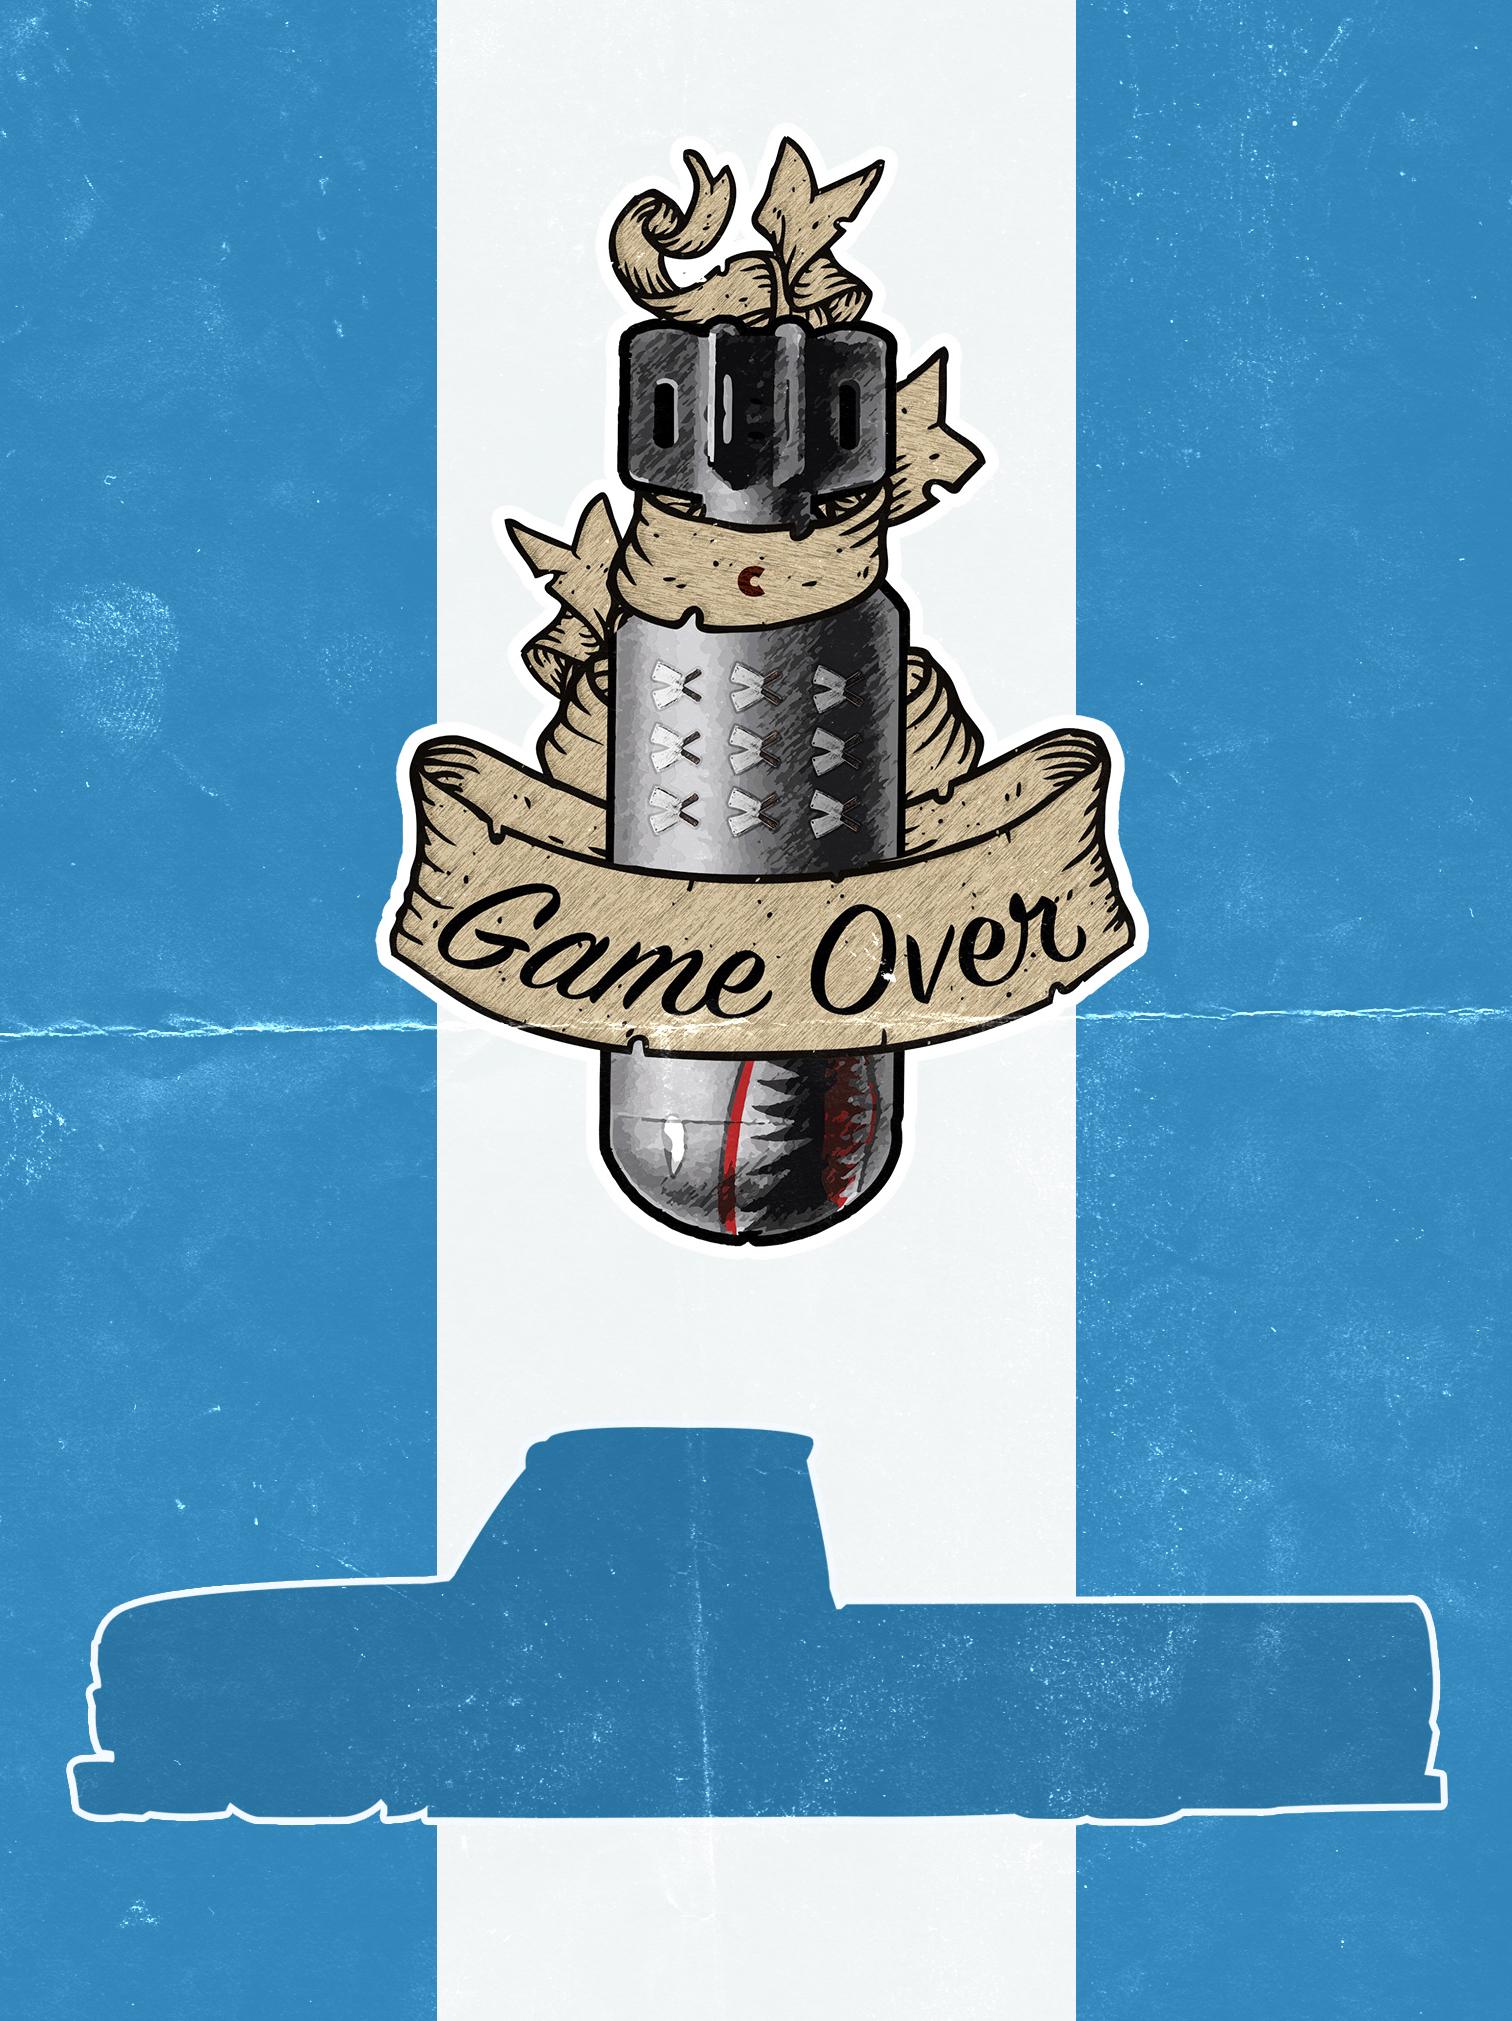 Posters-GameOver.jpg